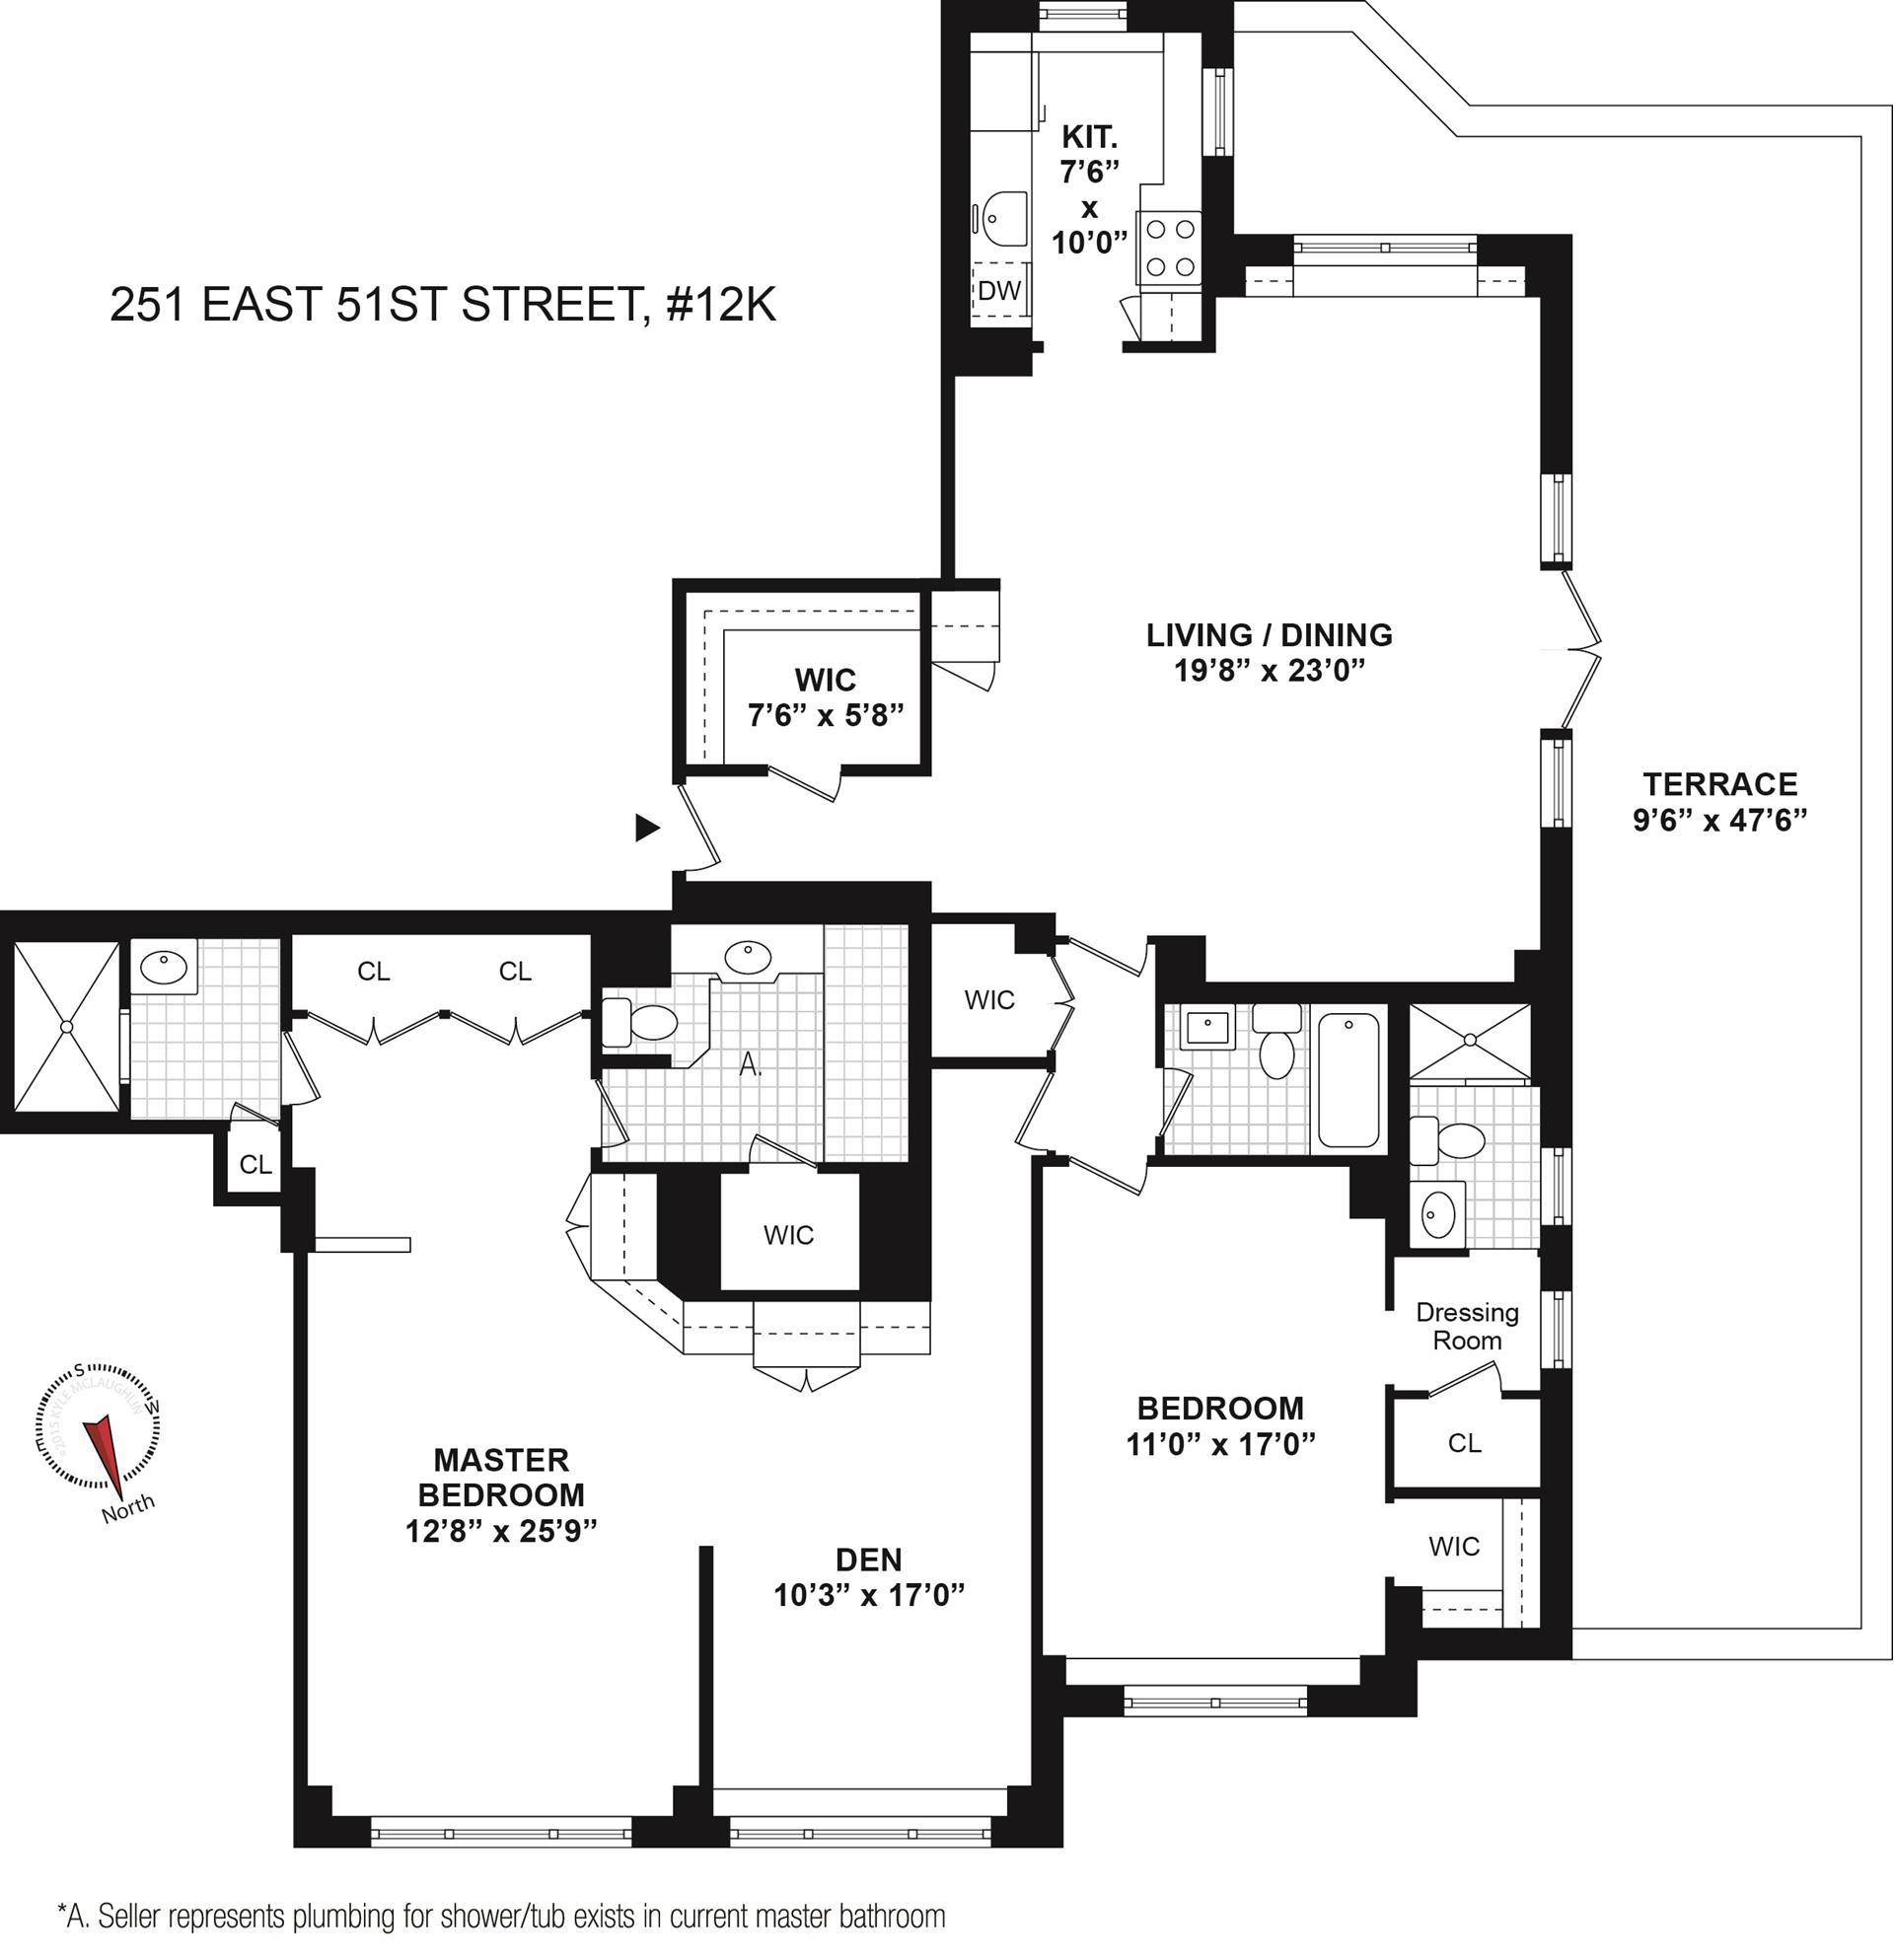 Floor plan of 251 East 51st St, 12M - Turtle Bay, New York